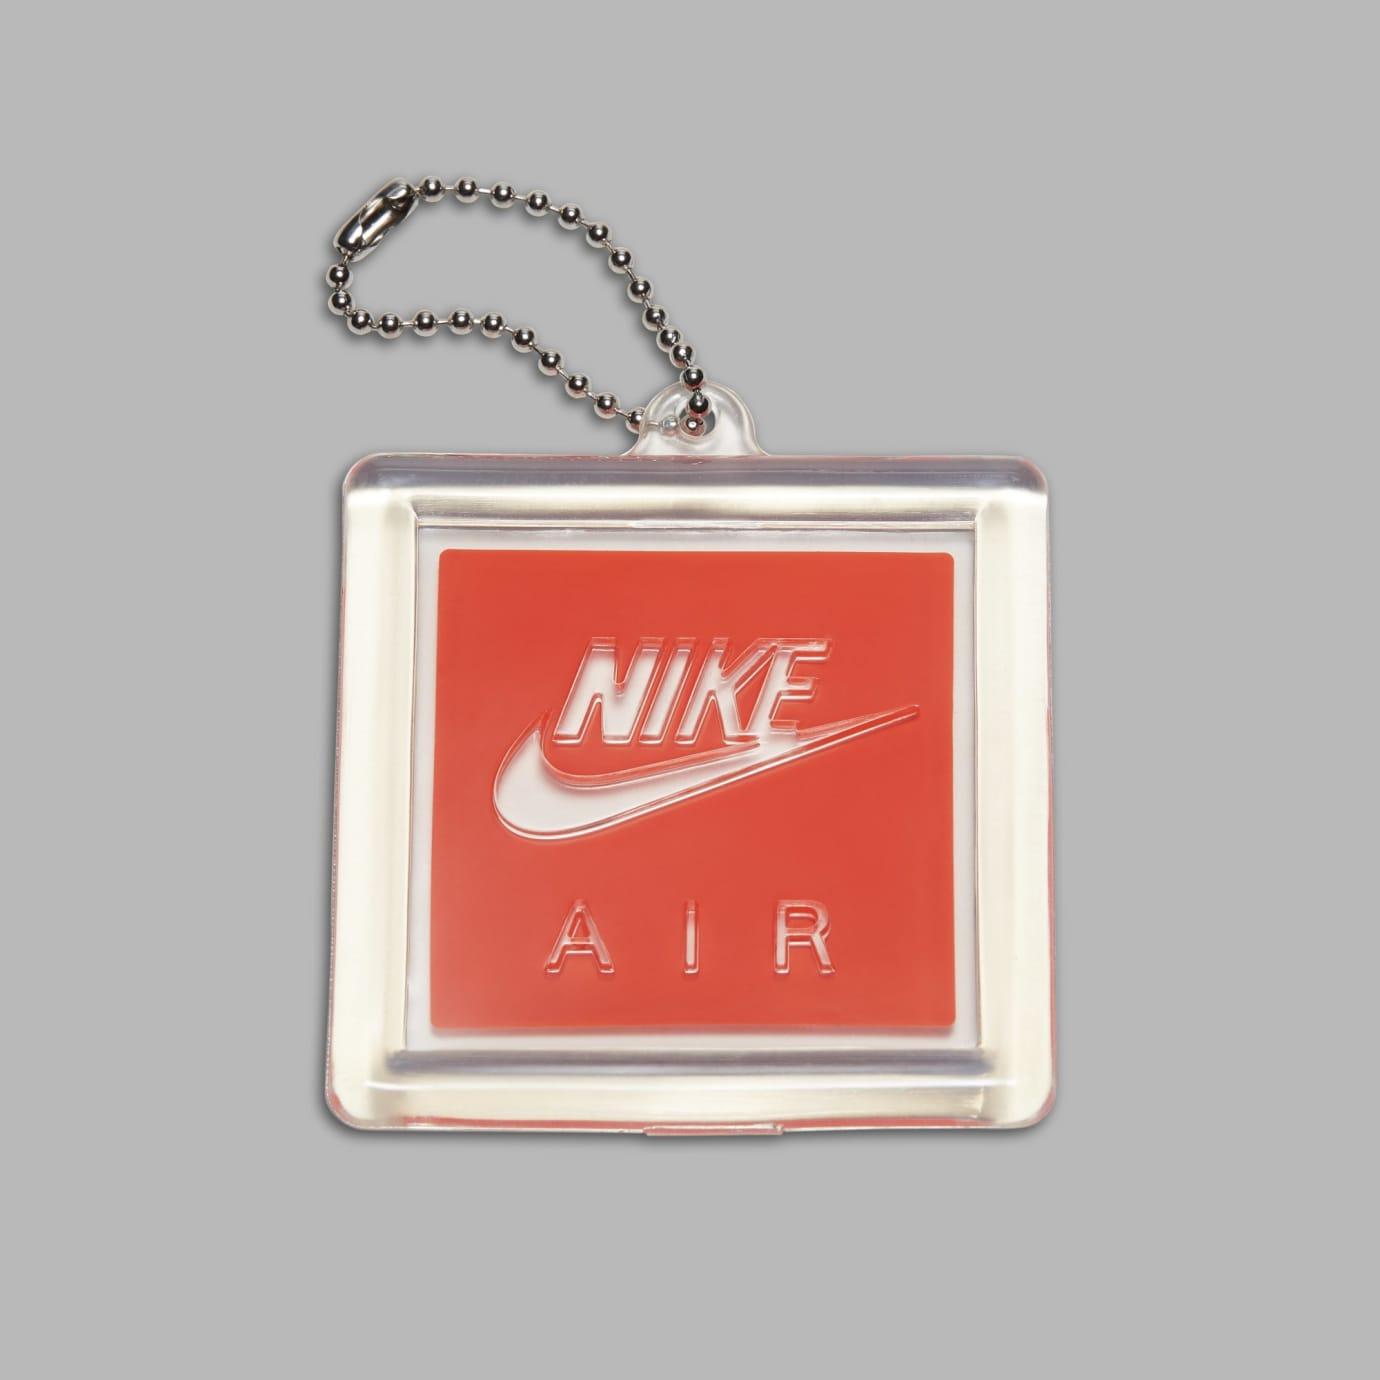 Air Jordan 3 Black/Cement Grey-White-Fire Red 854262-001 (Tag)